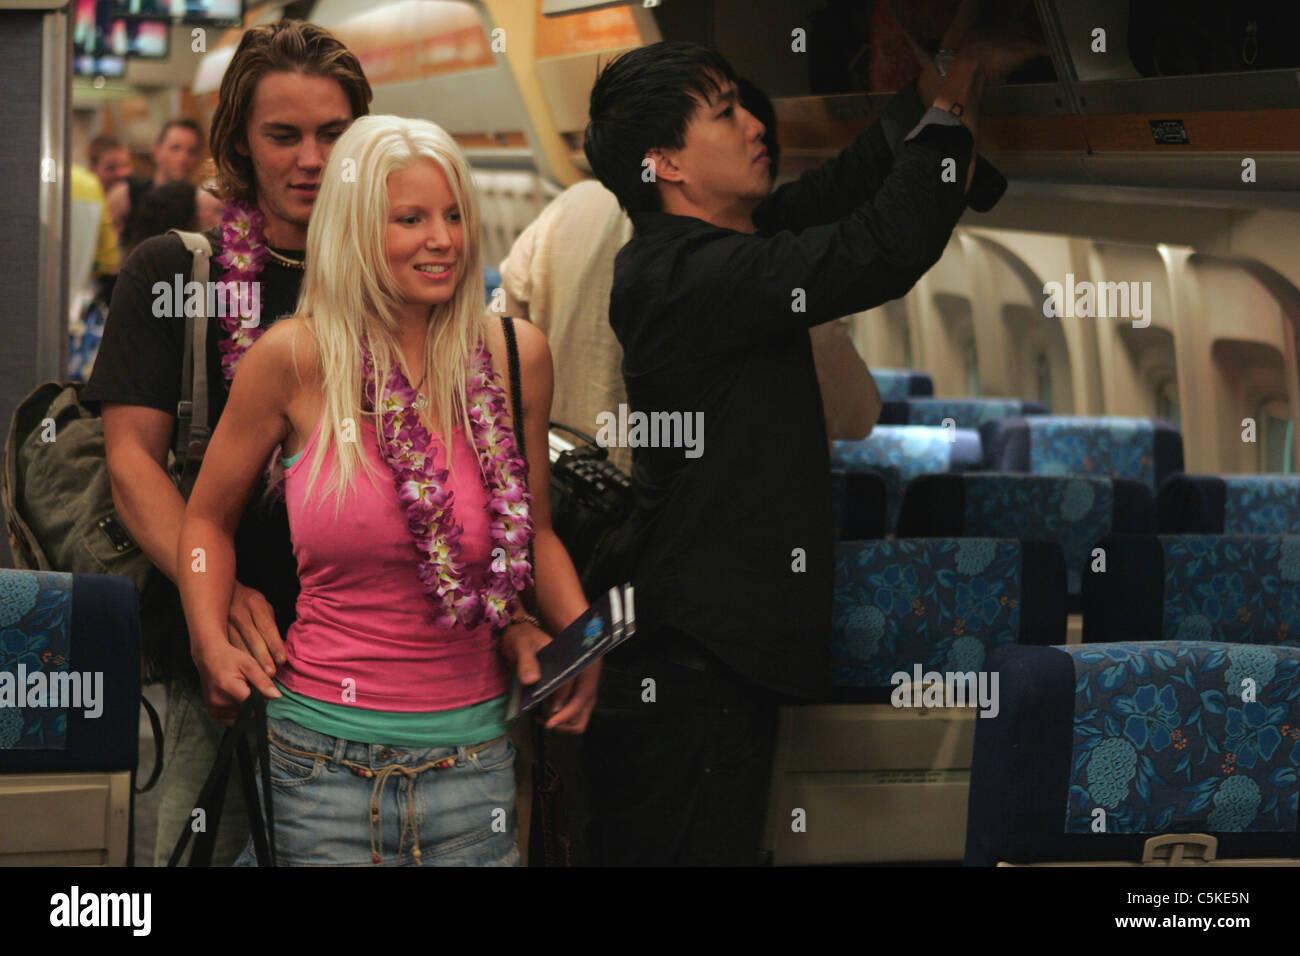 Snakes on a Plane  Year : 2006 - USA Samantha McLeod, Taylor Kitsch  Director : David R. Ellis Stock Photo